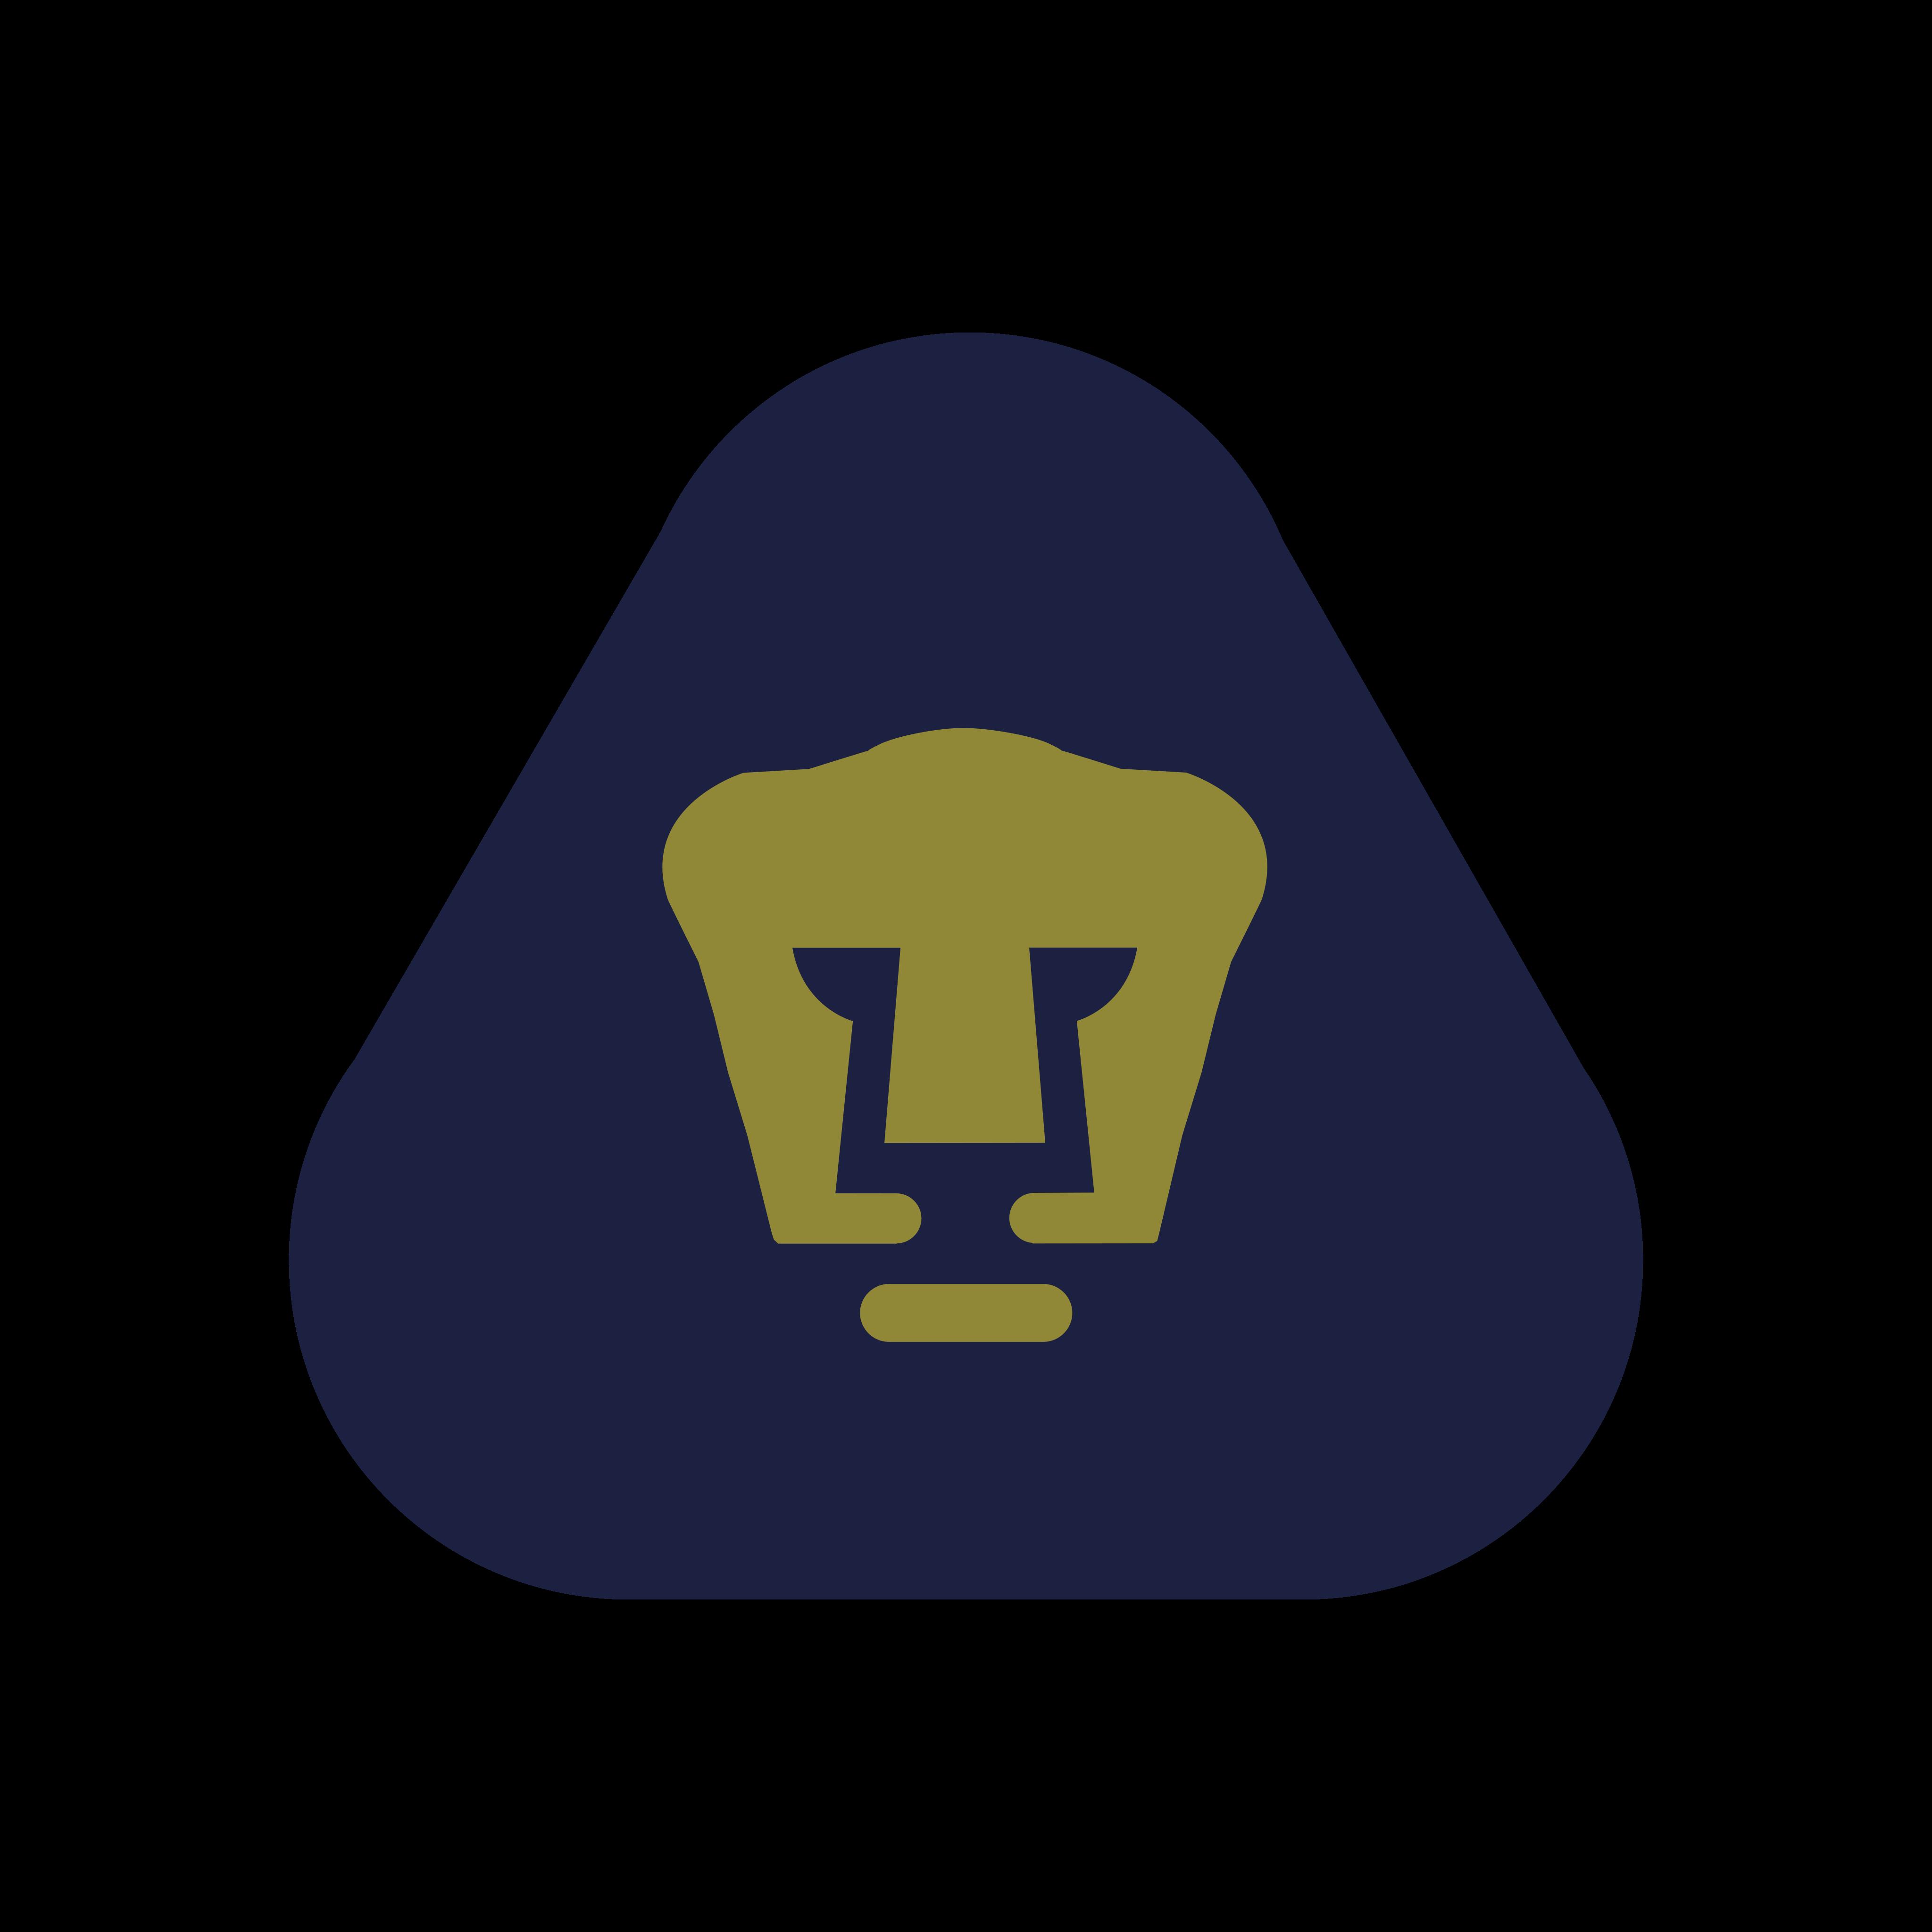 pumas unam logo 0 - Pumas UNAM Logo - Escudo